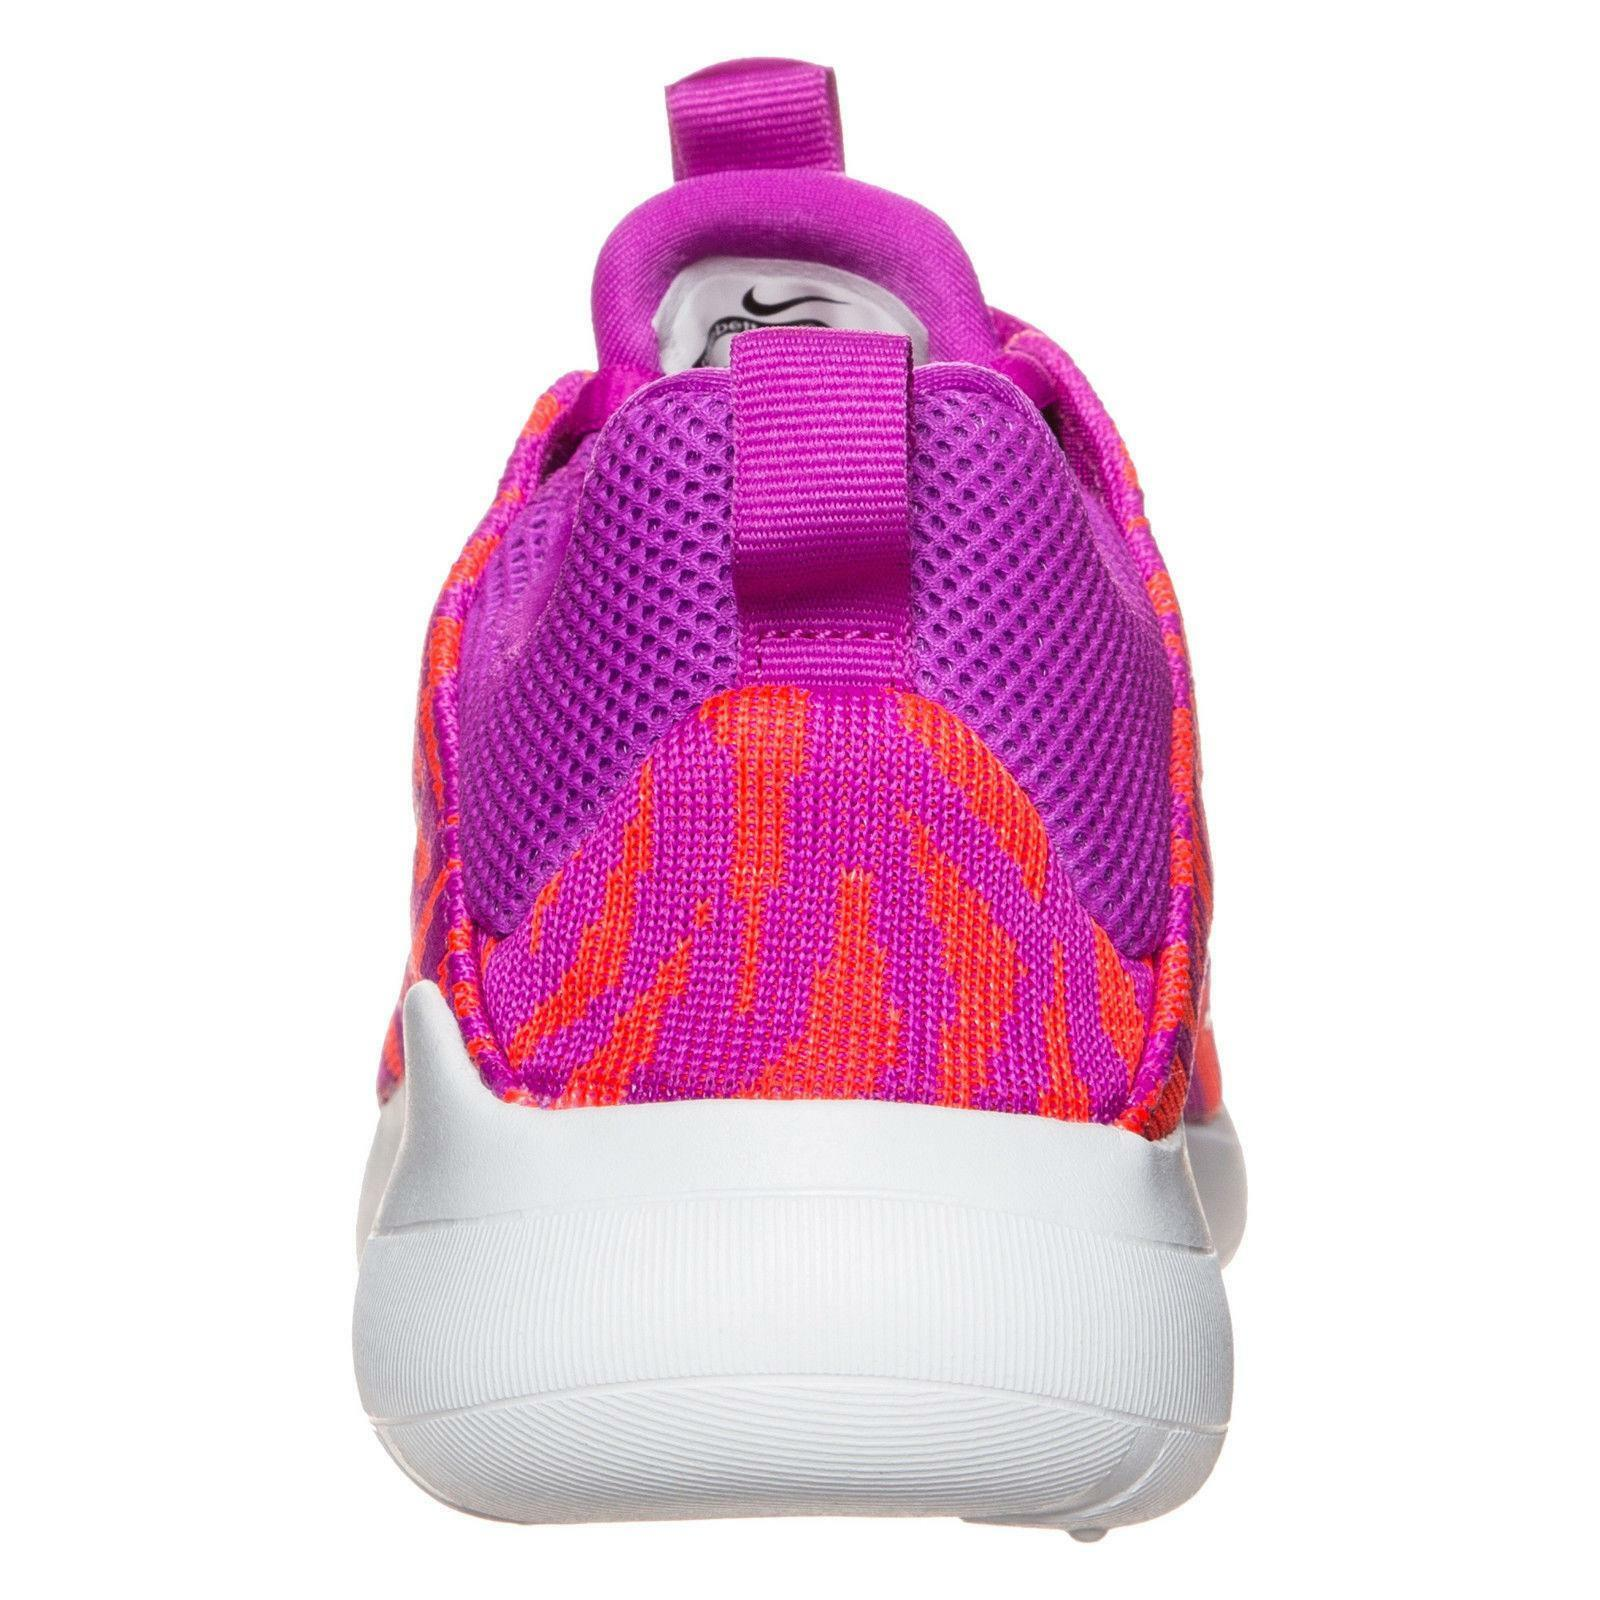 Kaishi 0 Running 2 Baskets 833660 Femme Kaishi 0 2 Print Nike KJCRD t5nw1Aqz6